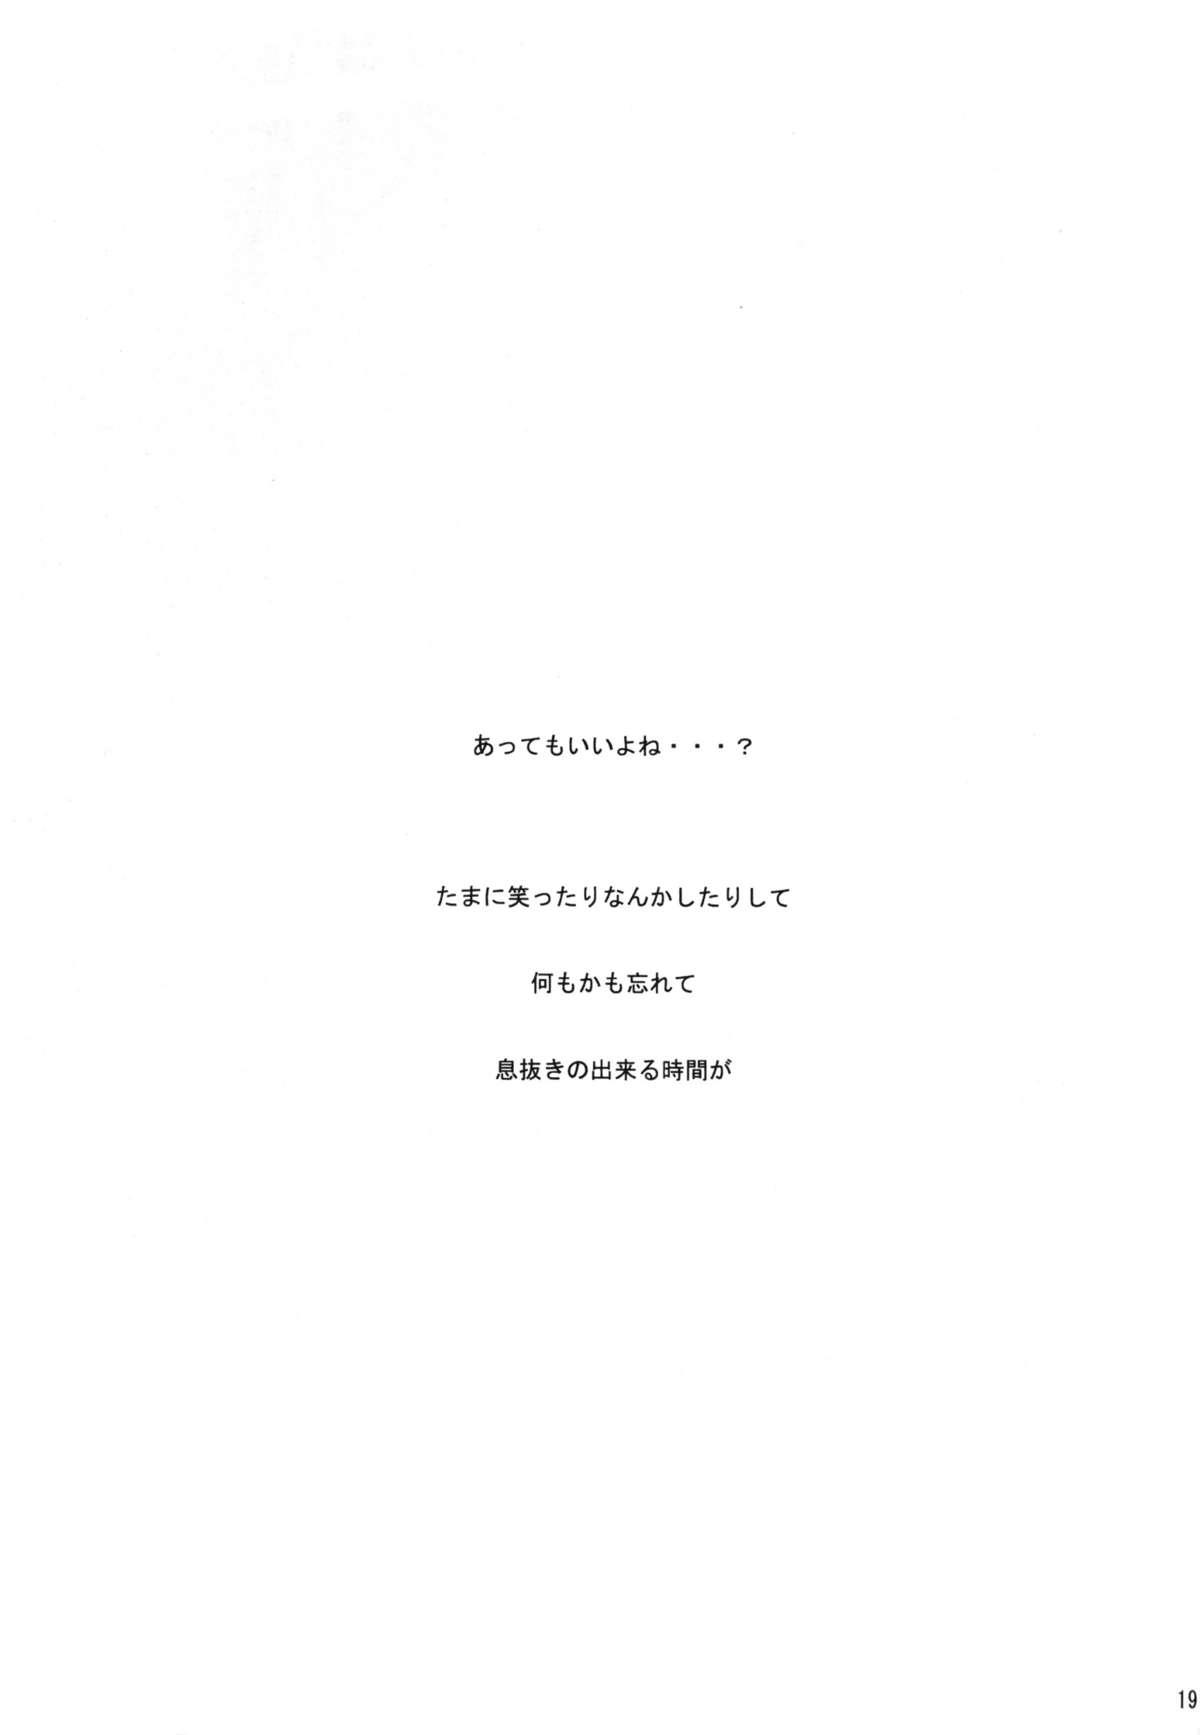 (C70) [HAMUSTAR (Chibinyo)] Hamu-juu -San- (Naruto) 17